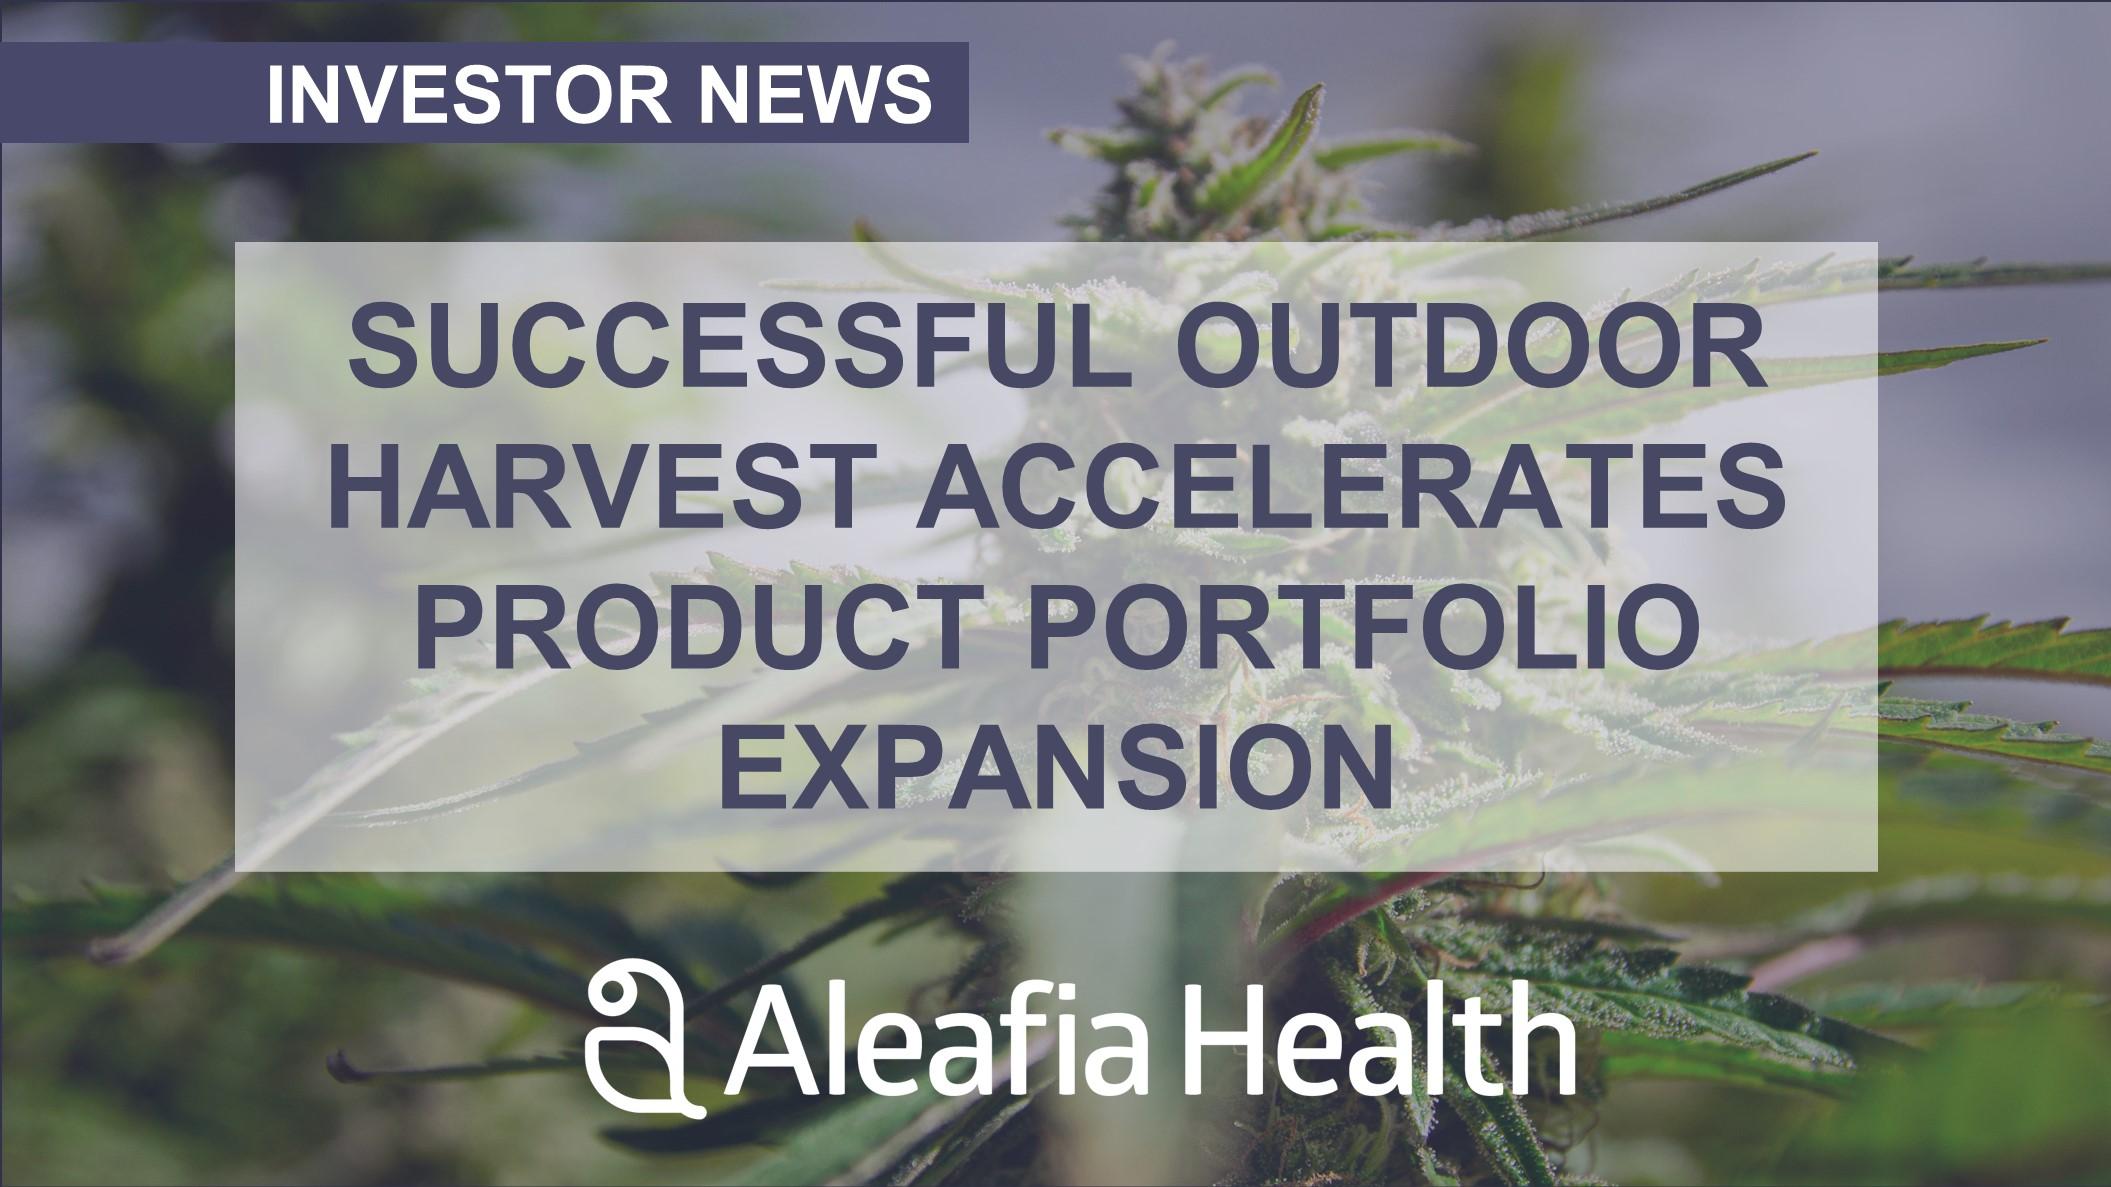 Aleafia Health Successful Outdoor Harvest Accelerates Product Portfolio Expansion